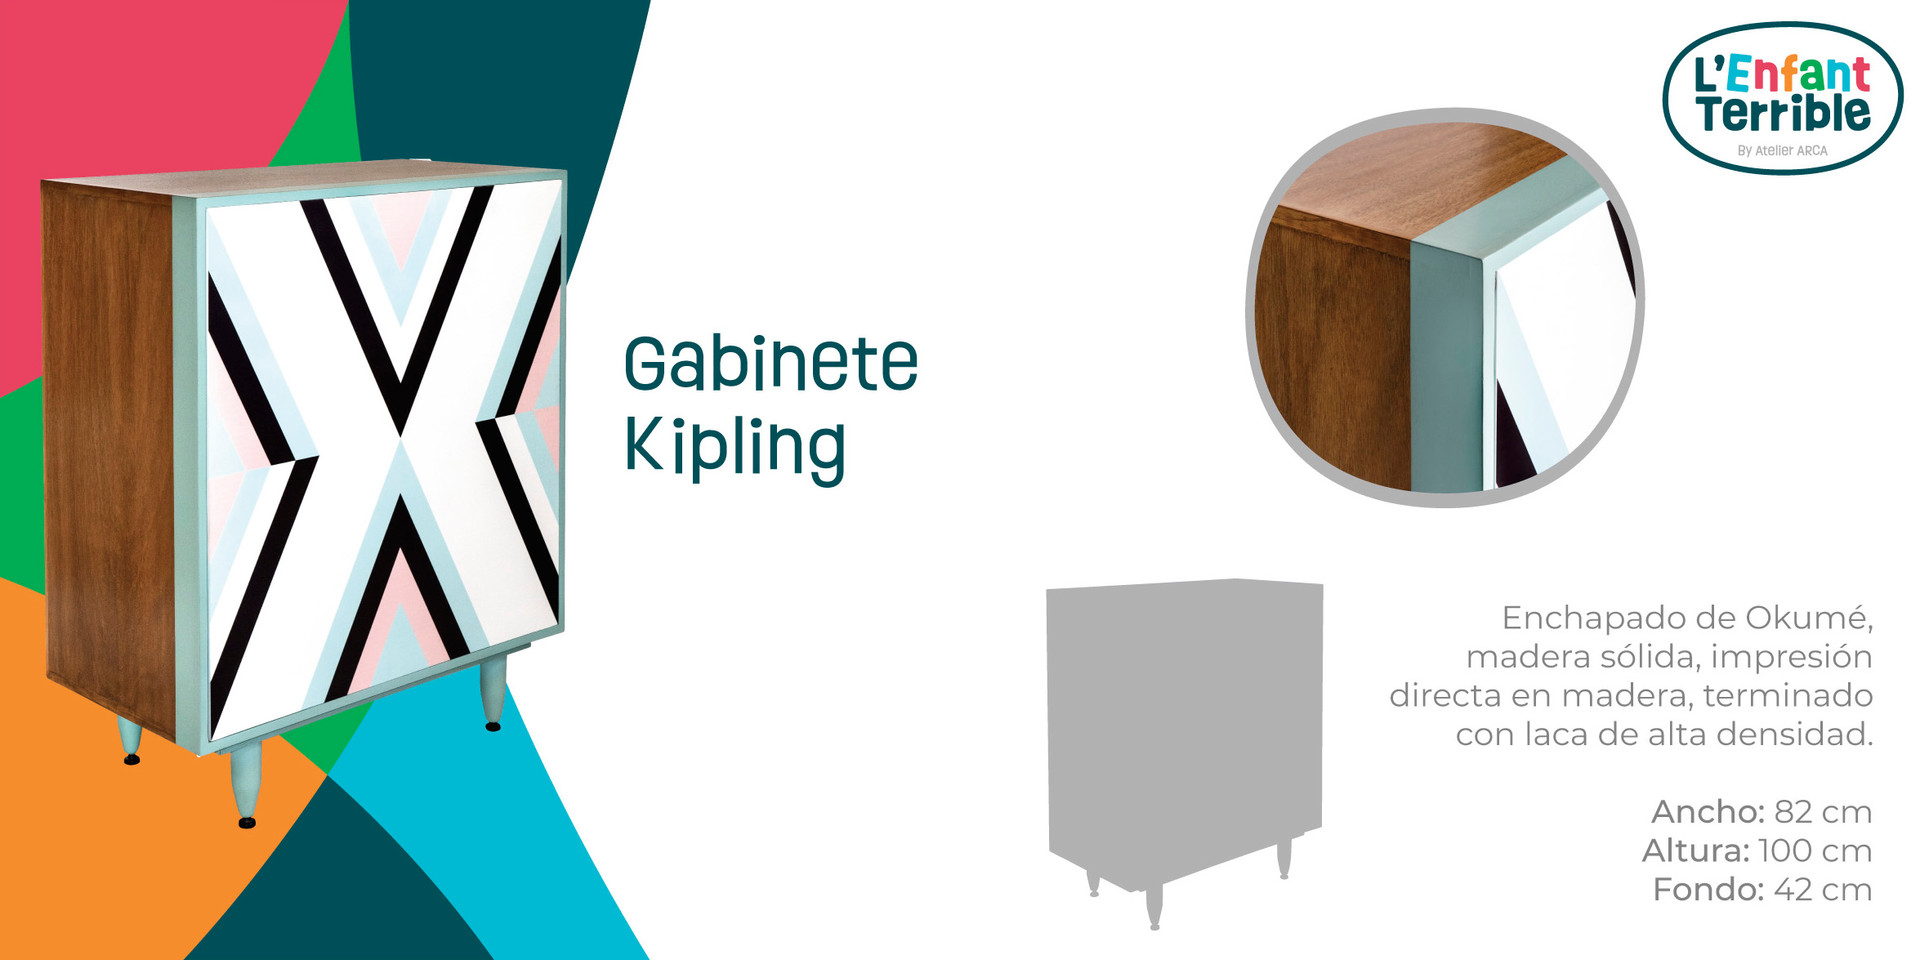 Gabinete Kipling